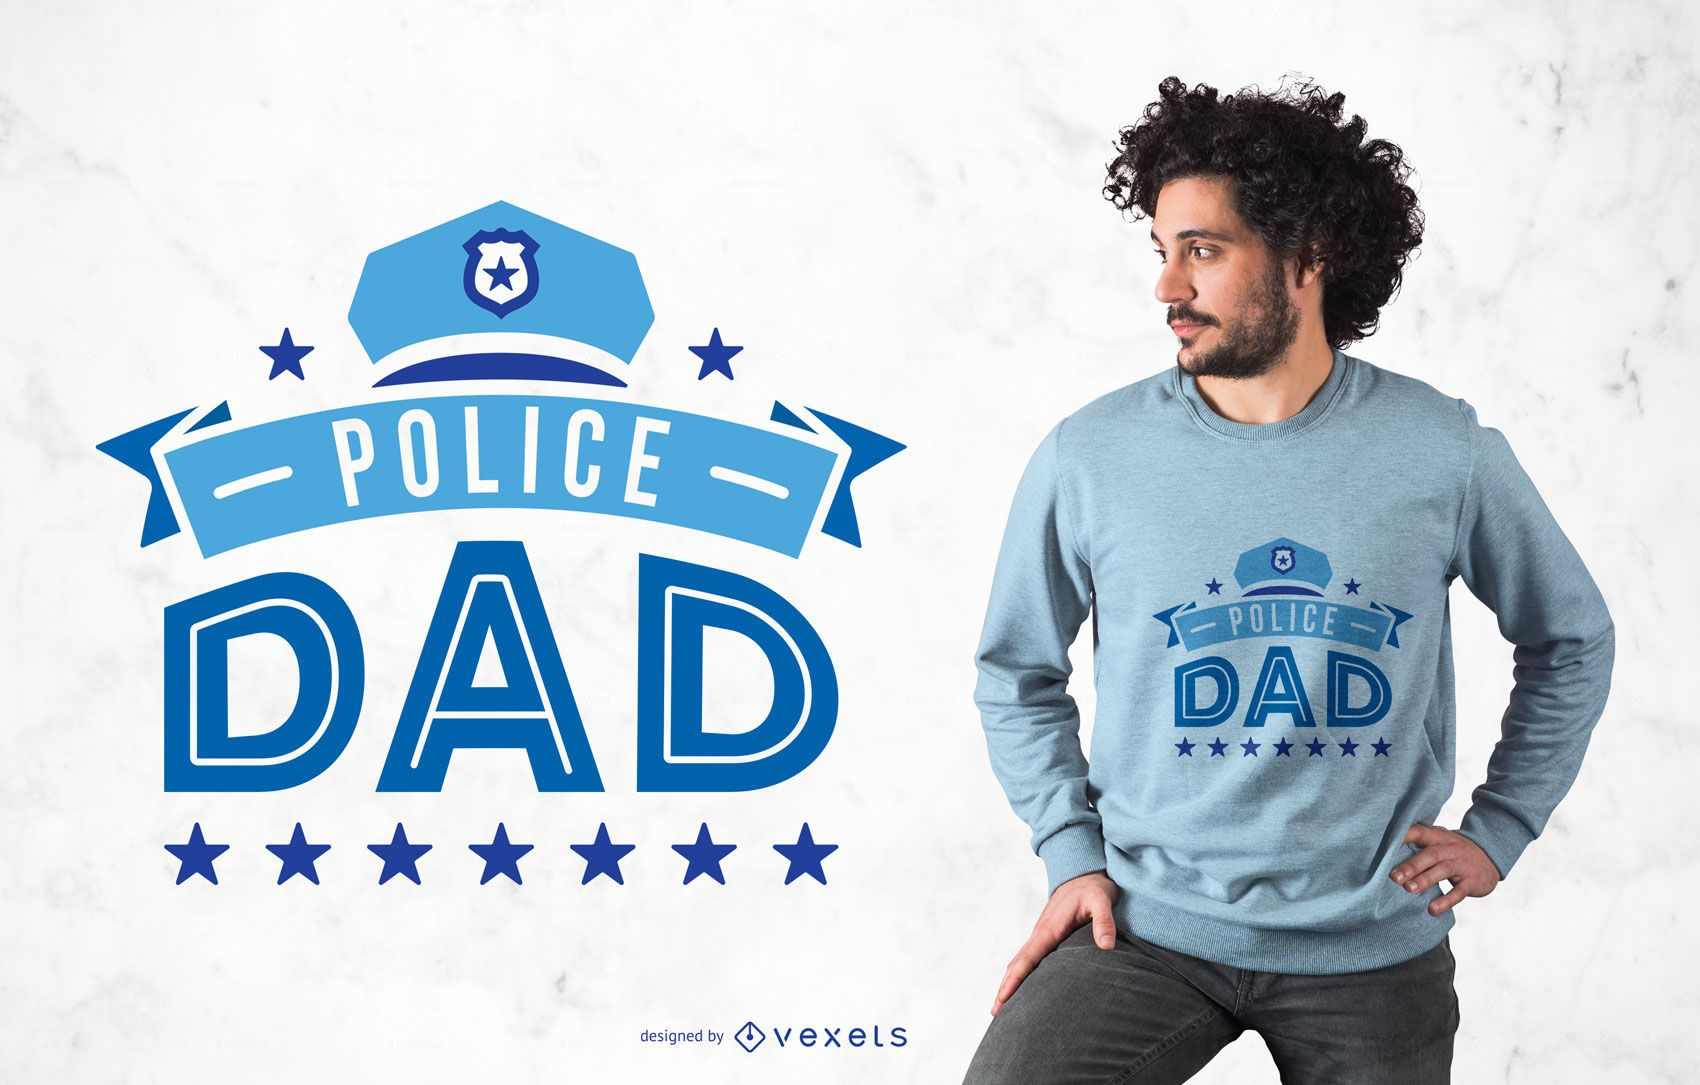 Police Dad T-shirt Design